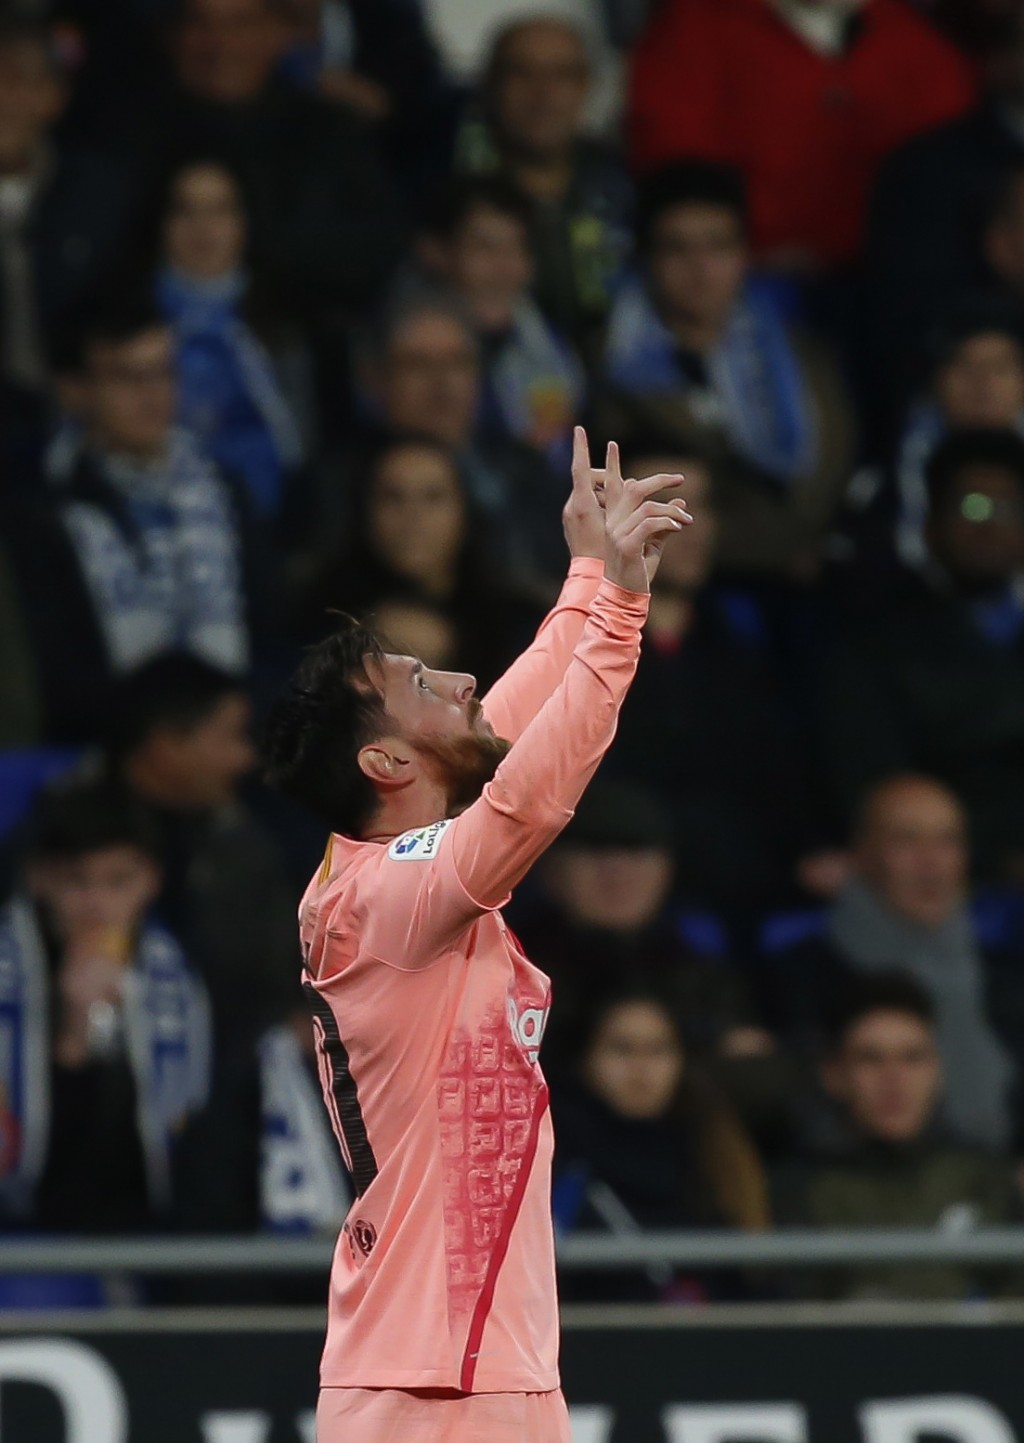 FC Barcelona's Lionel Messi celebrates during the Spanish La Liga soccer match between Espanyol and FC Barcelona at RCDE stadium in Cornella Llobregat